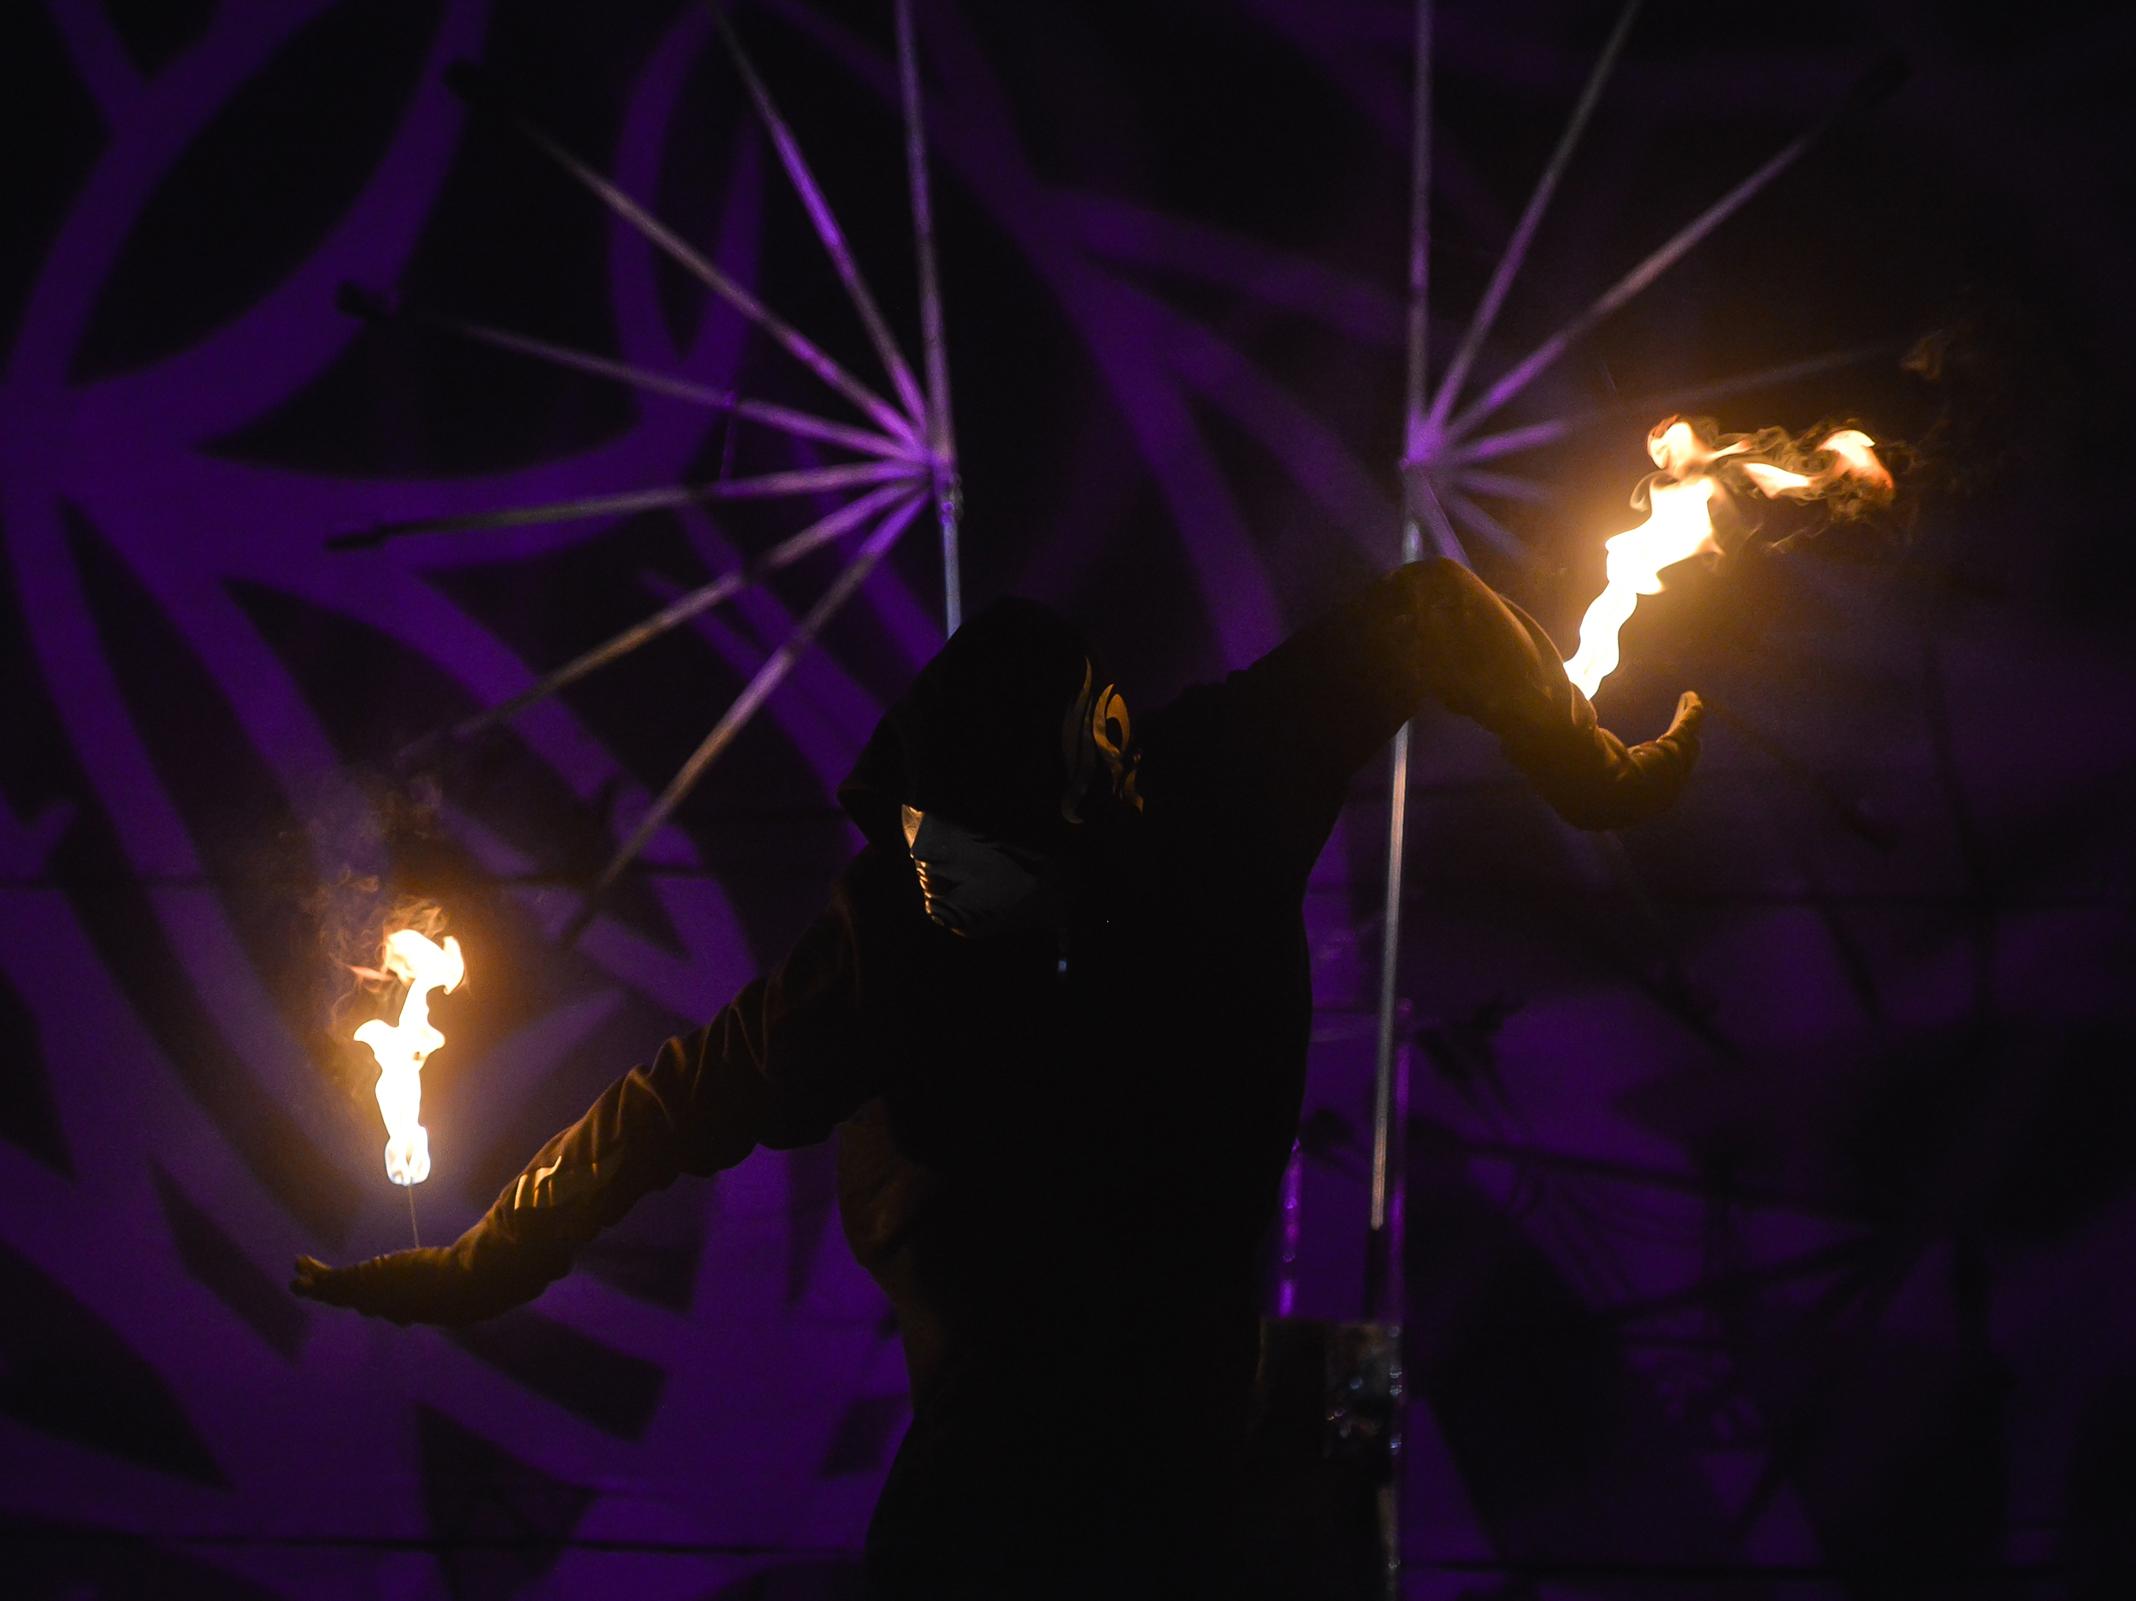 Fire Arts_Flaming Fire team_leeroy (1)